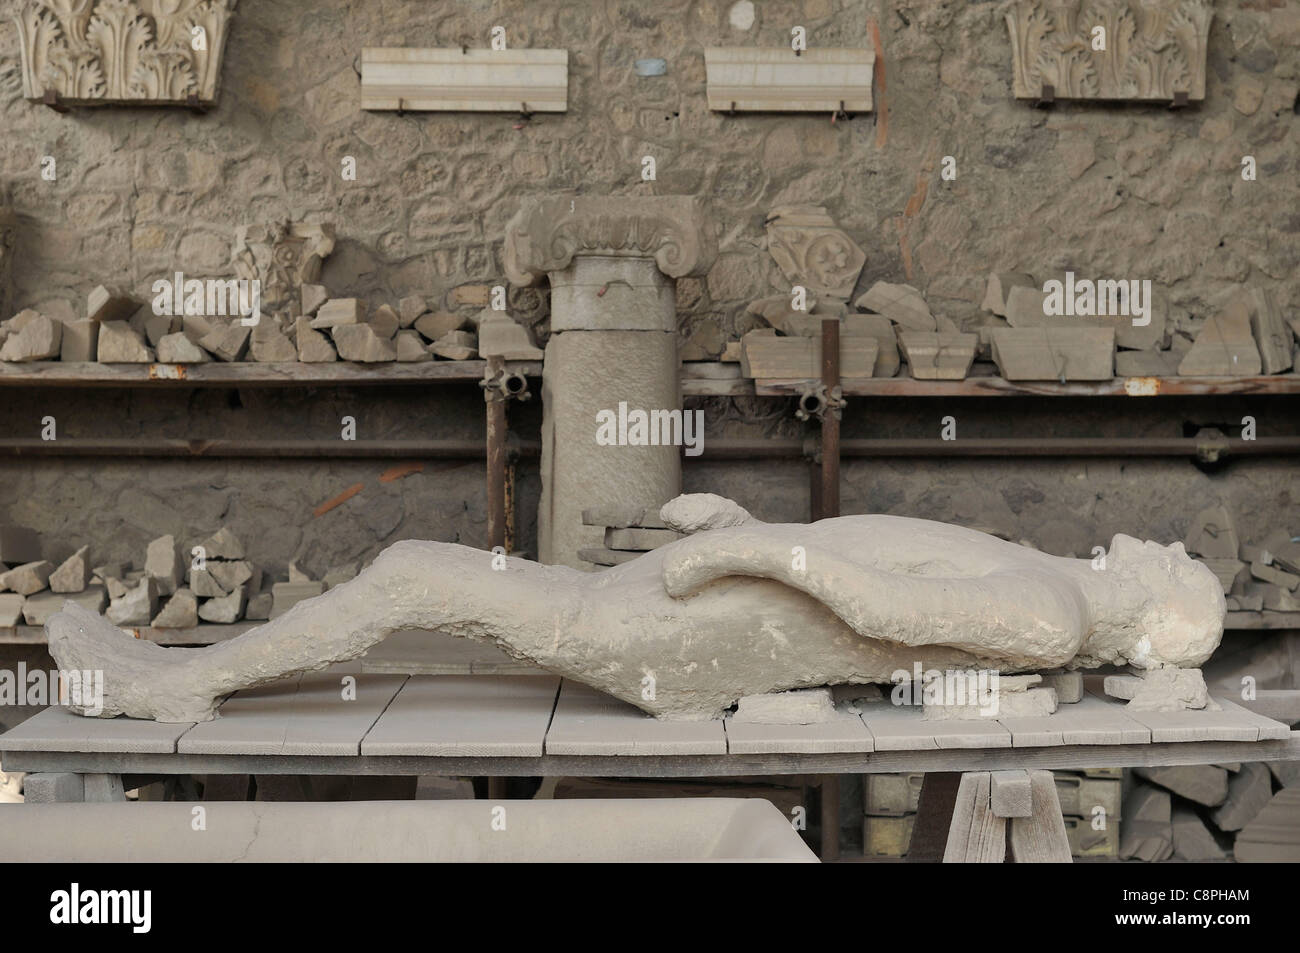 Pompei. Italy. Plaster cast of victim of the eruption of Vesuvius. - Stock Image